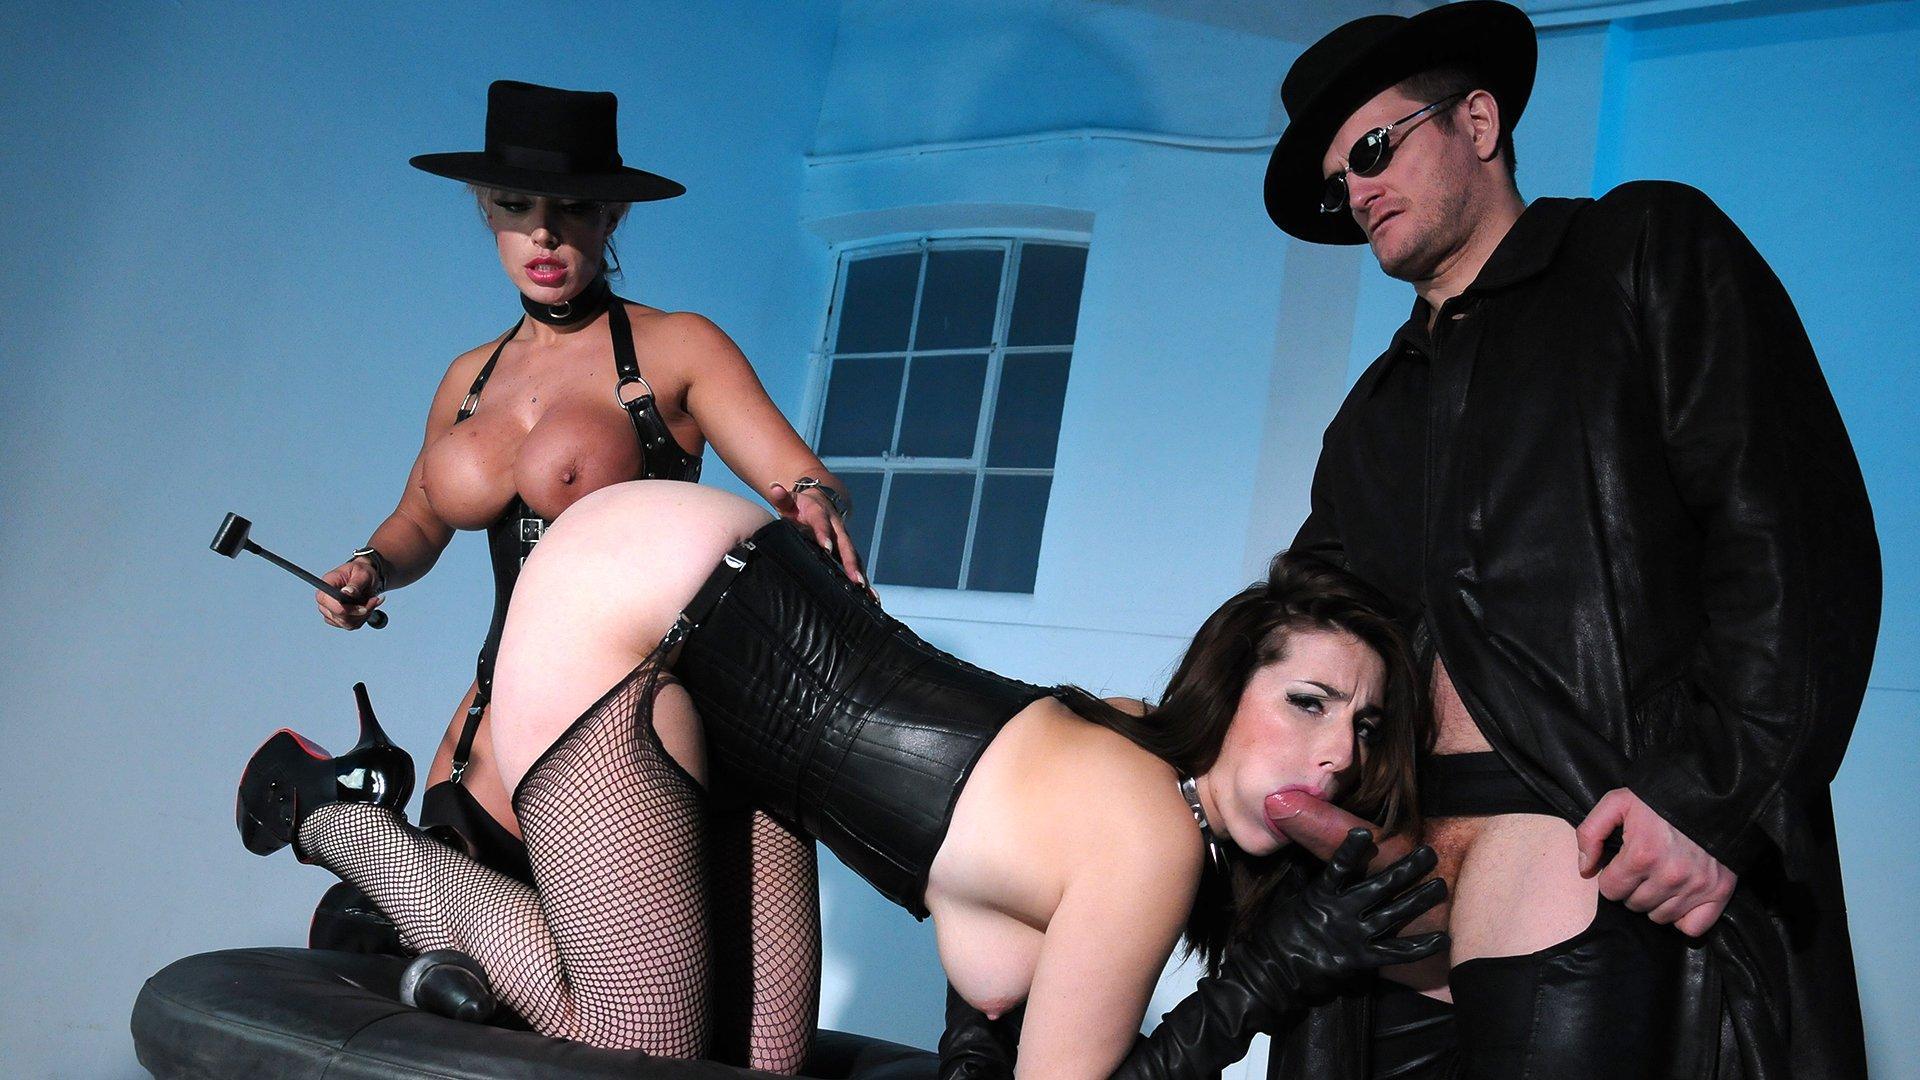 Dildo Fuck Machine and Hard Fucking In Sex Swing